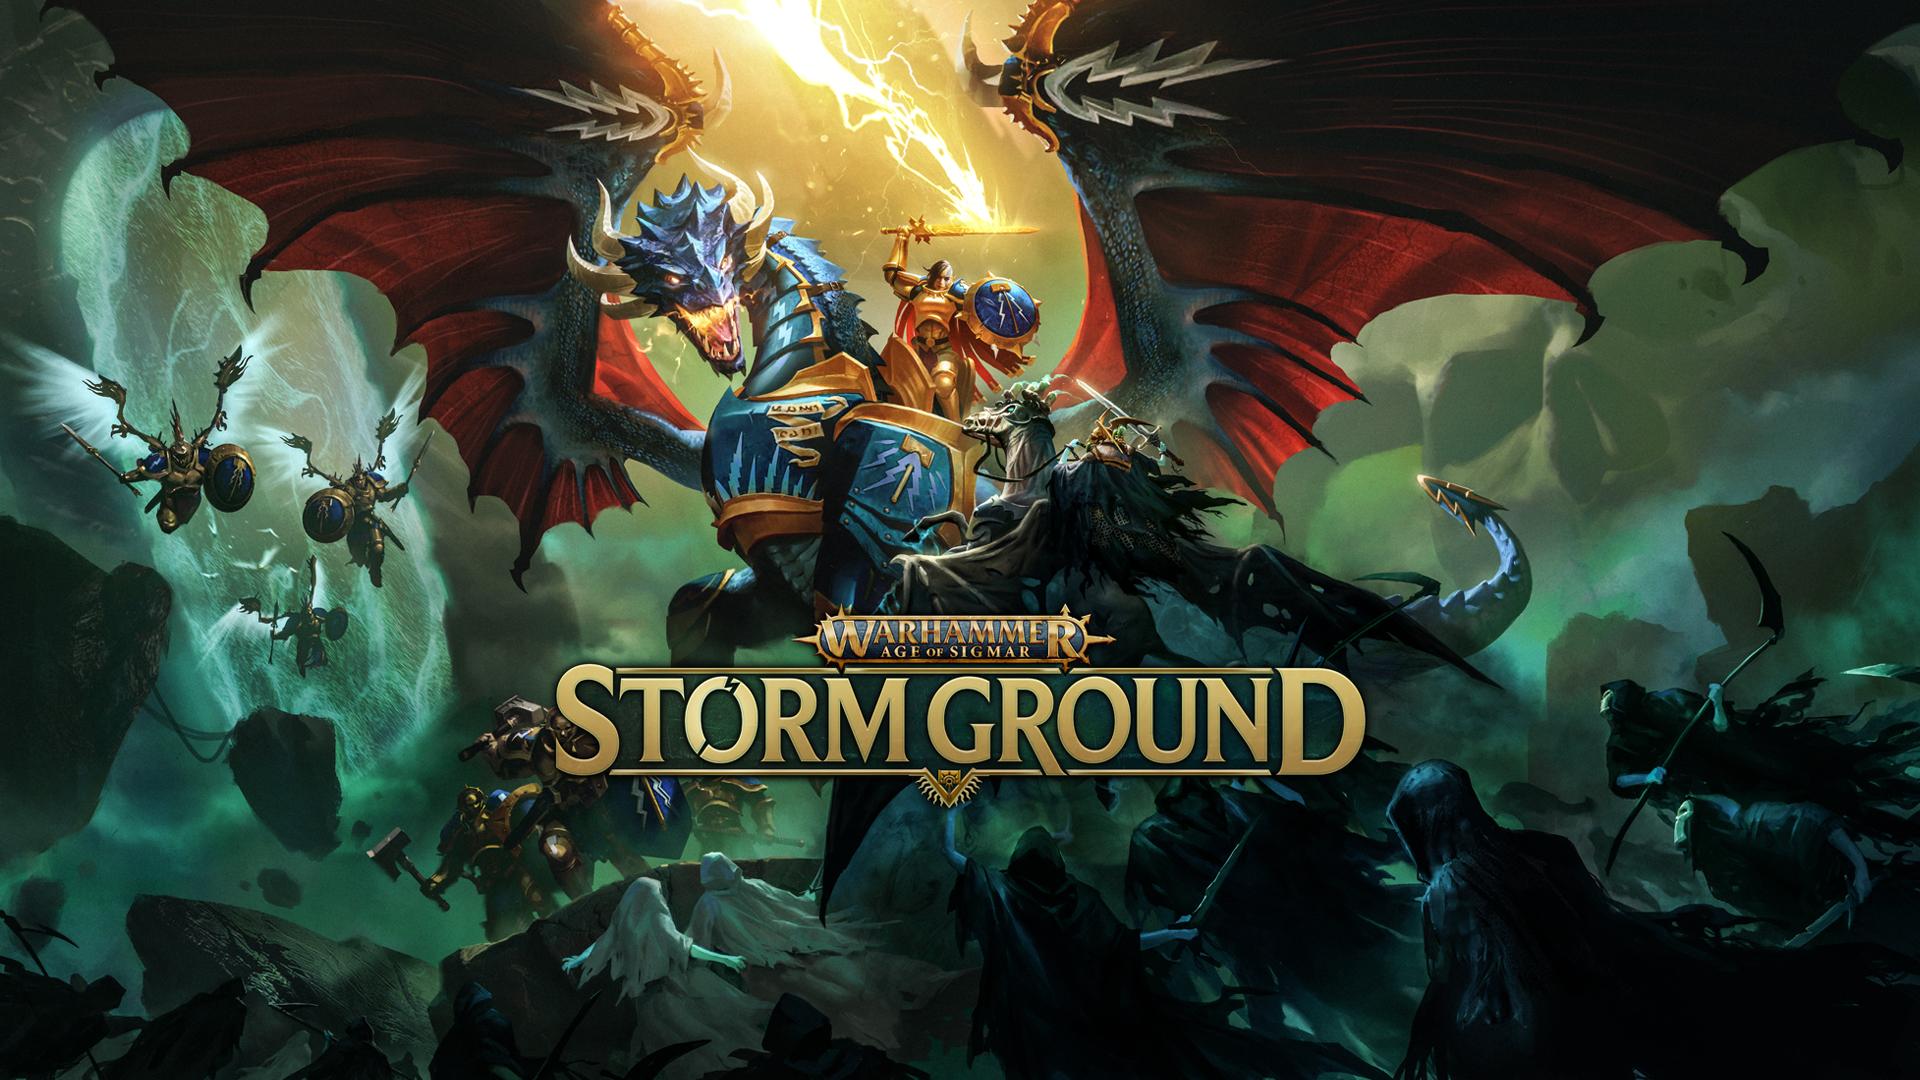 Warhammer Age of Sigmar Storm Ground Key Art